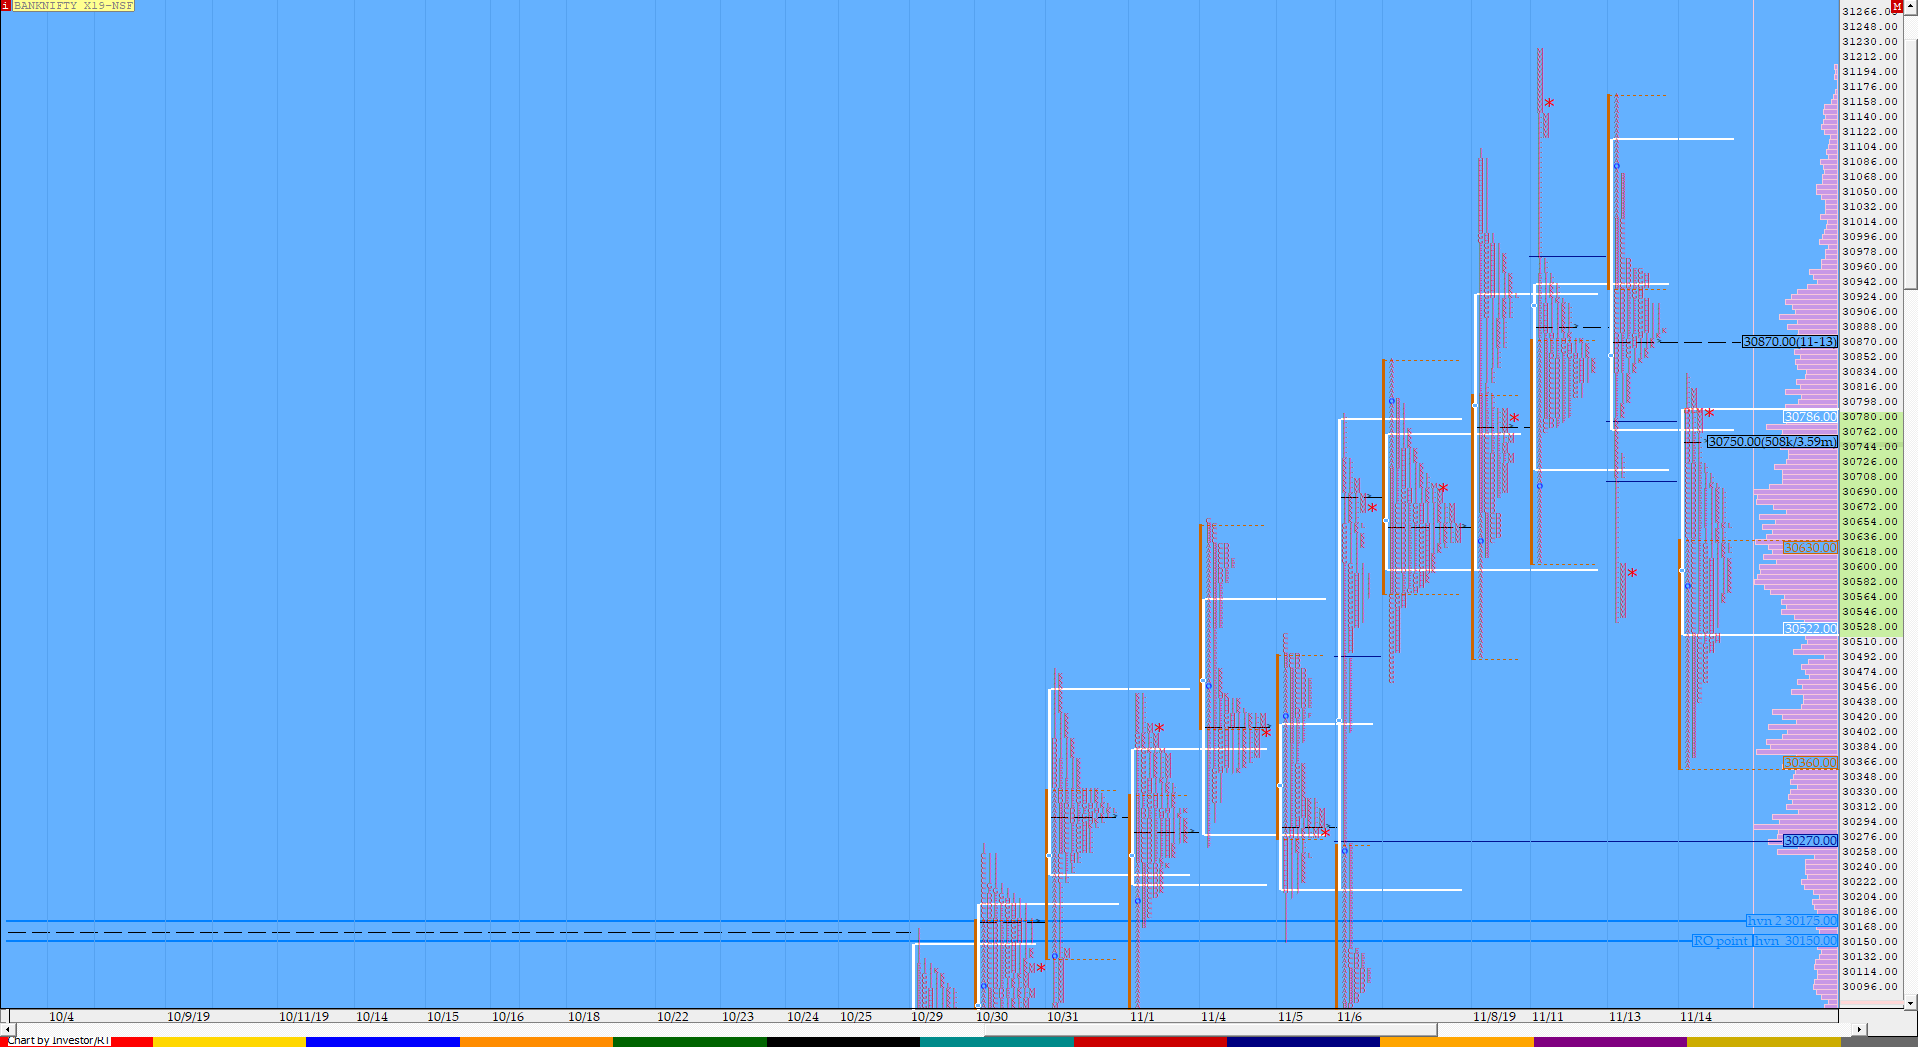 Market Profile Analysis dated 14th November 3